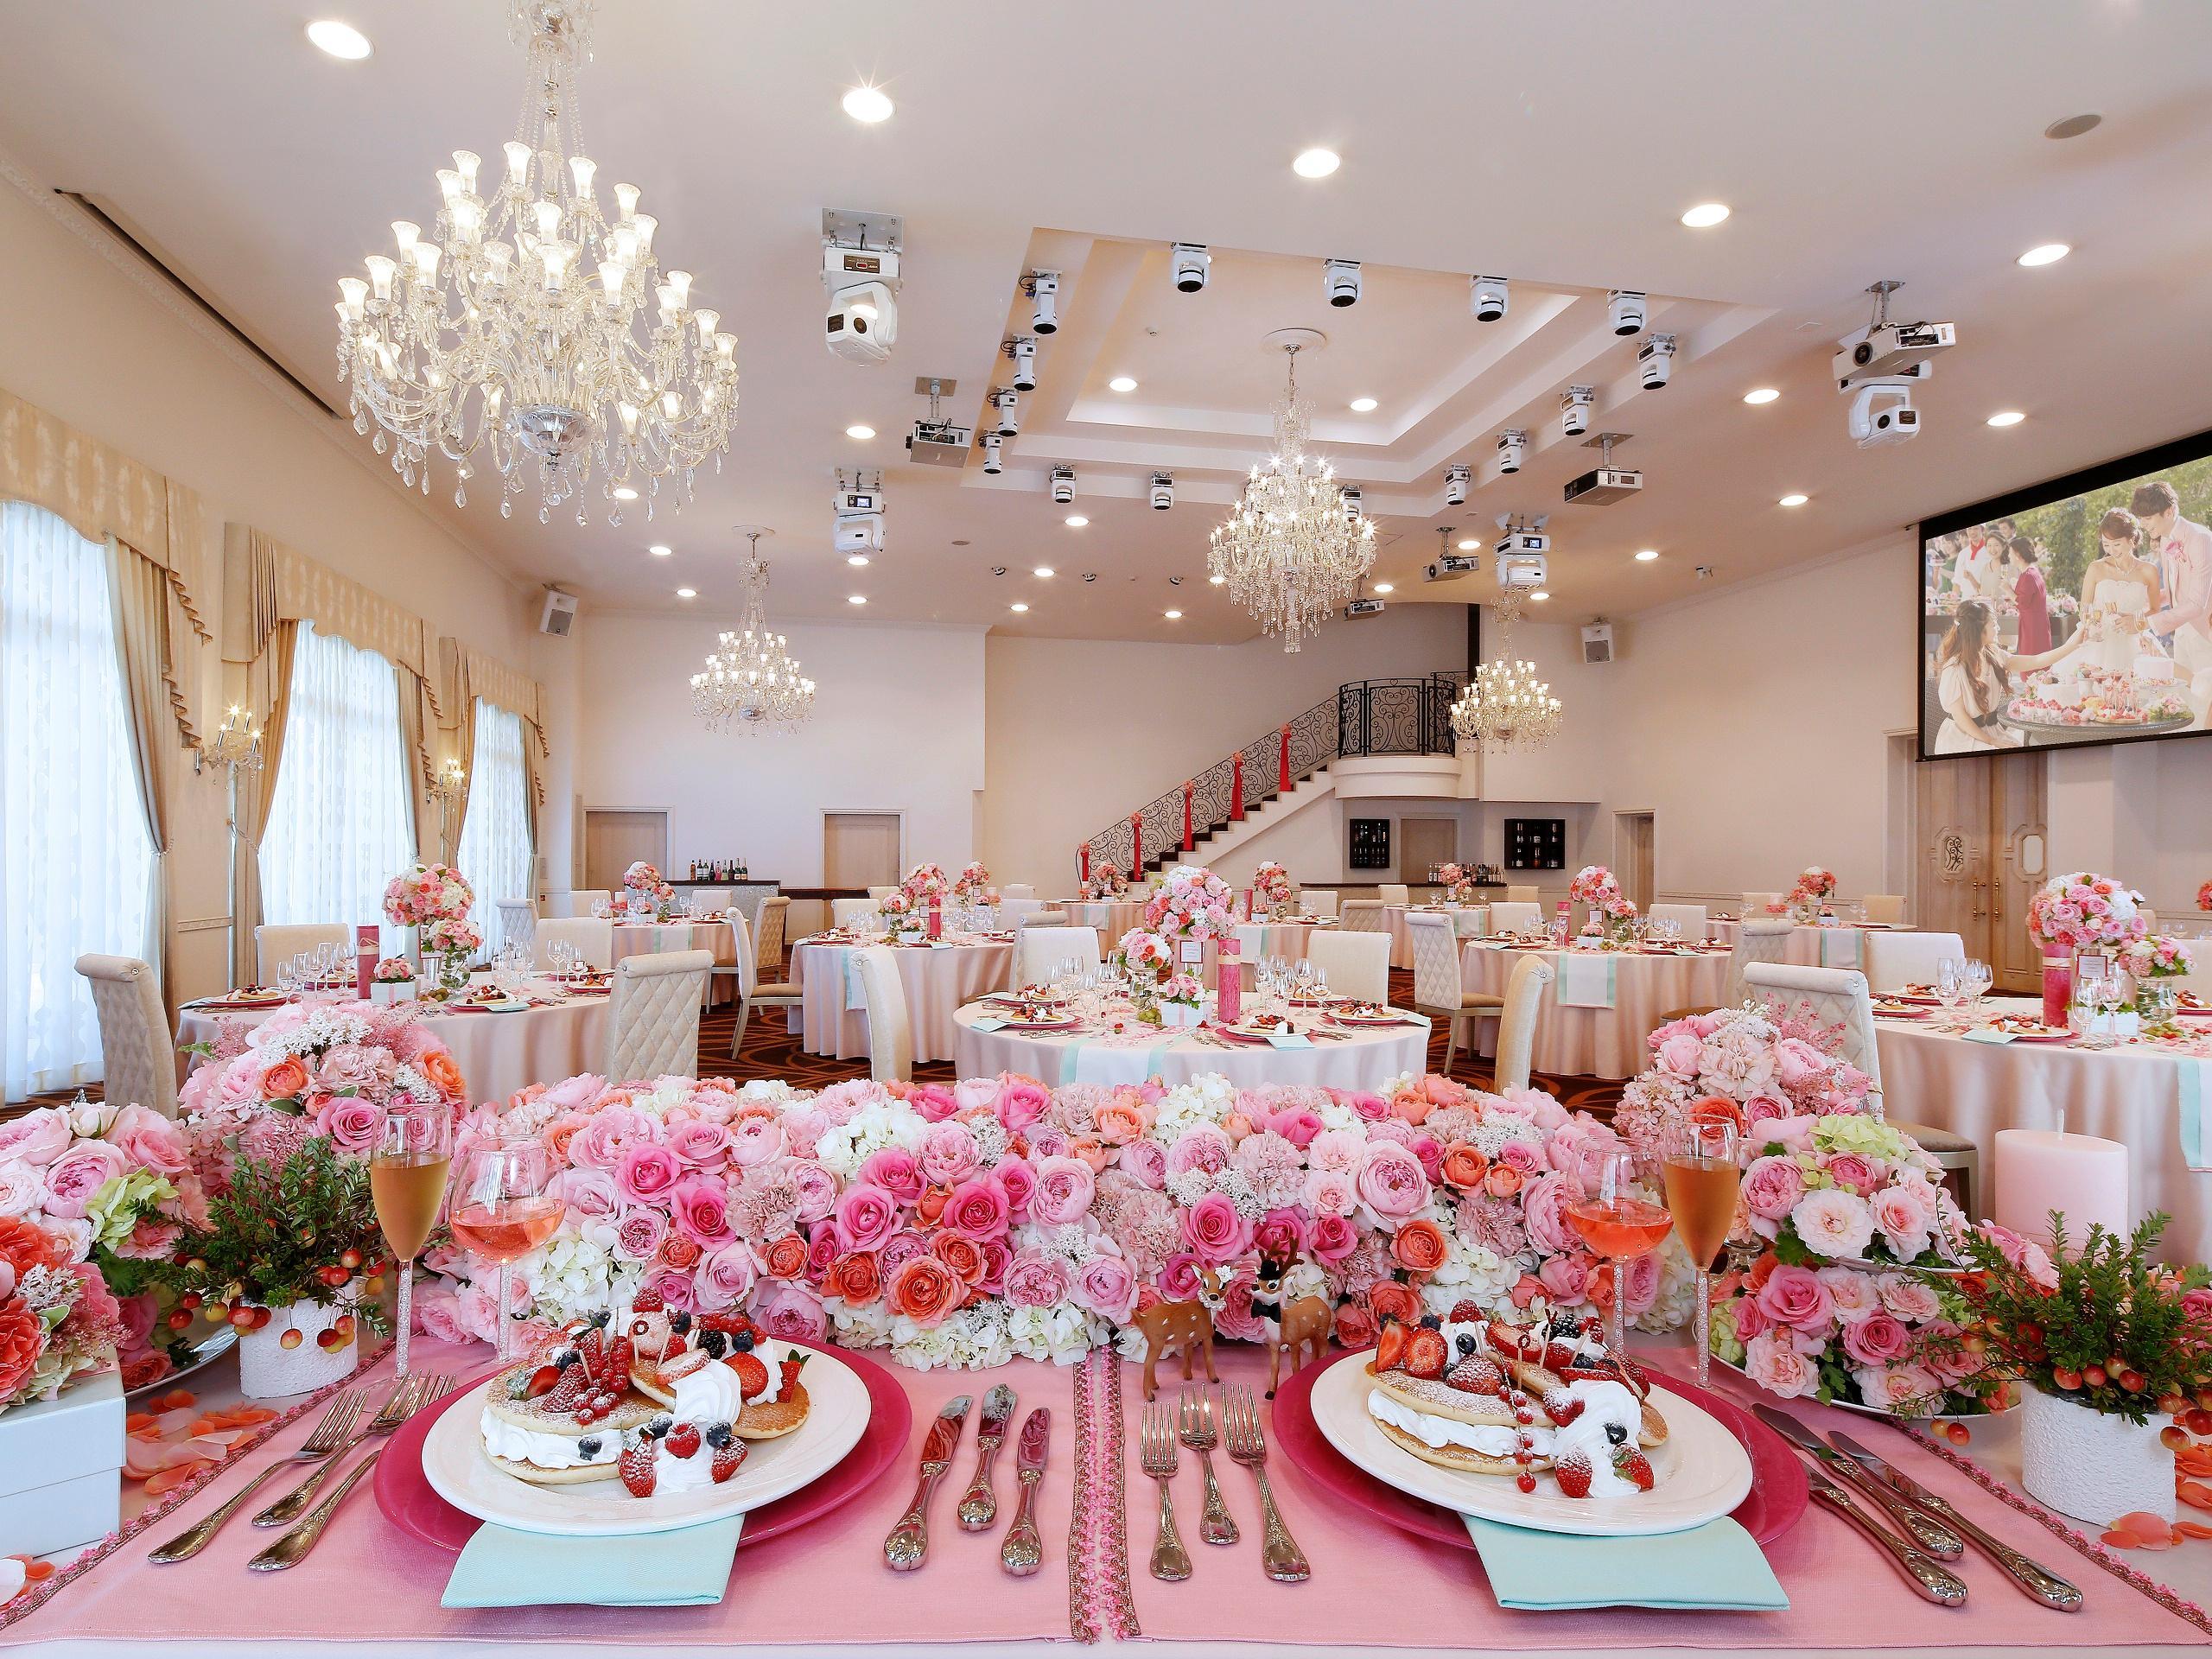 1955e76e347d0 最高の一日」~Wonderful Wedding~で結婚式